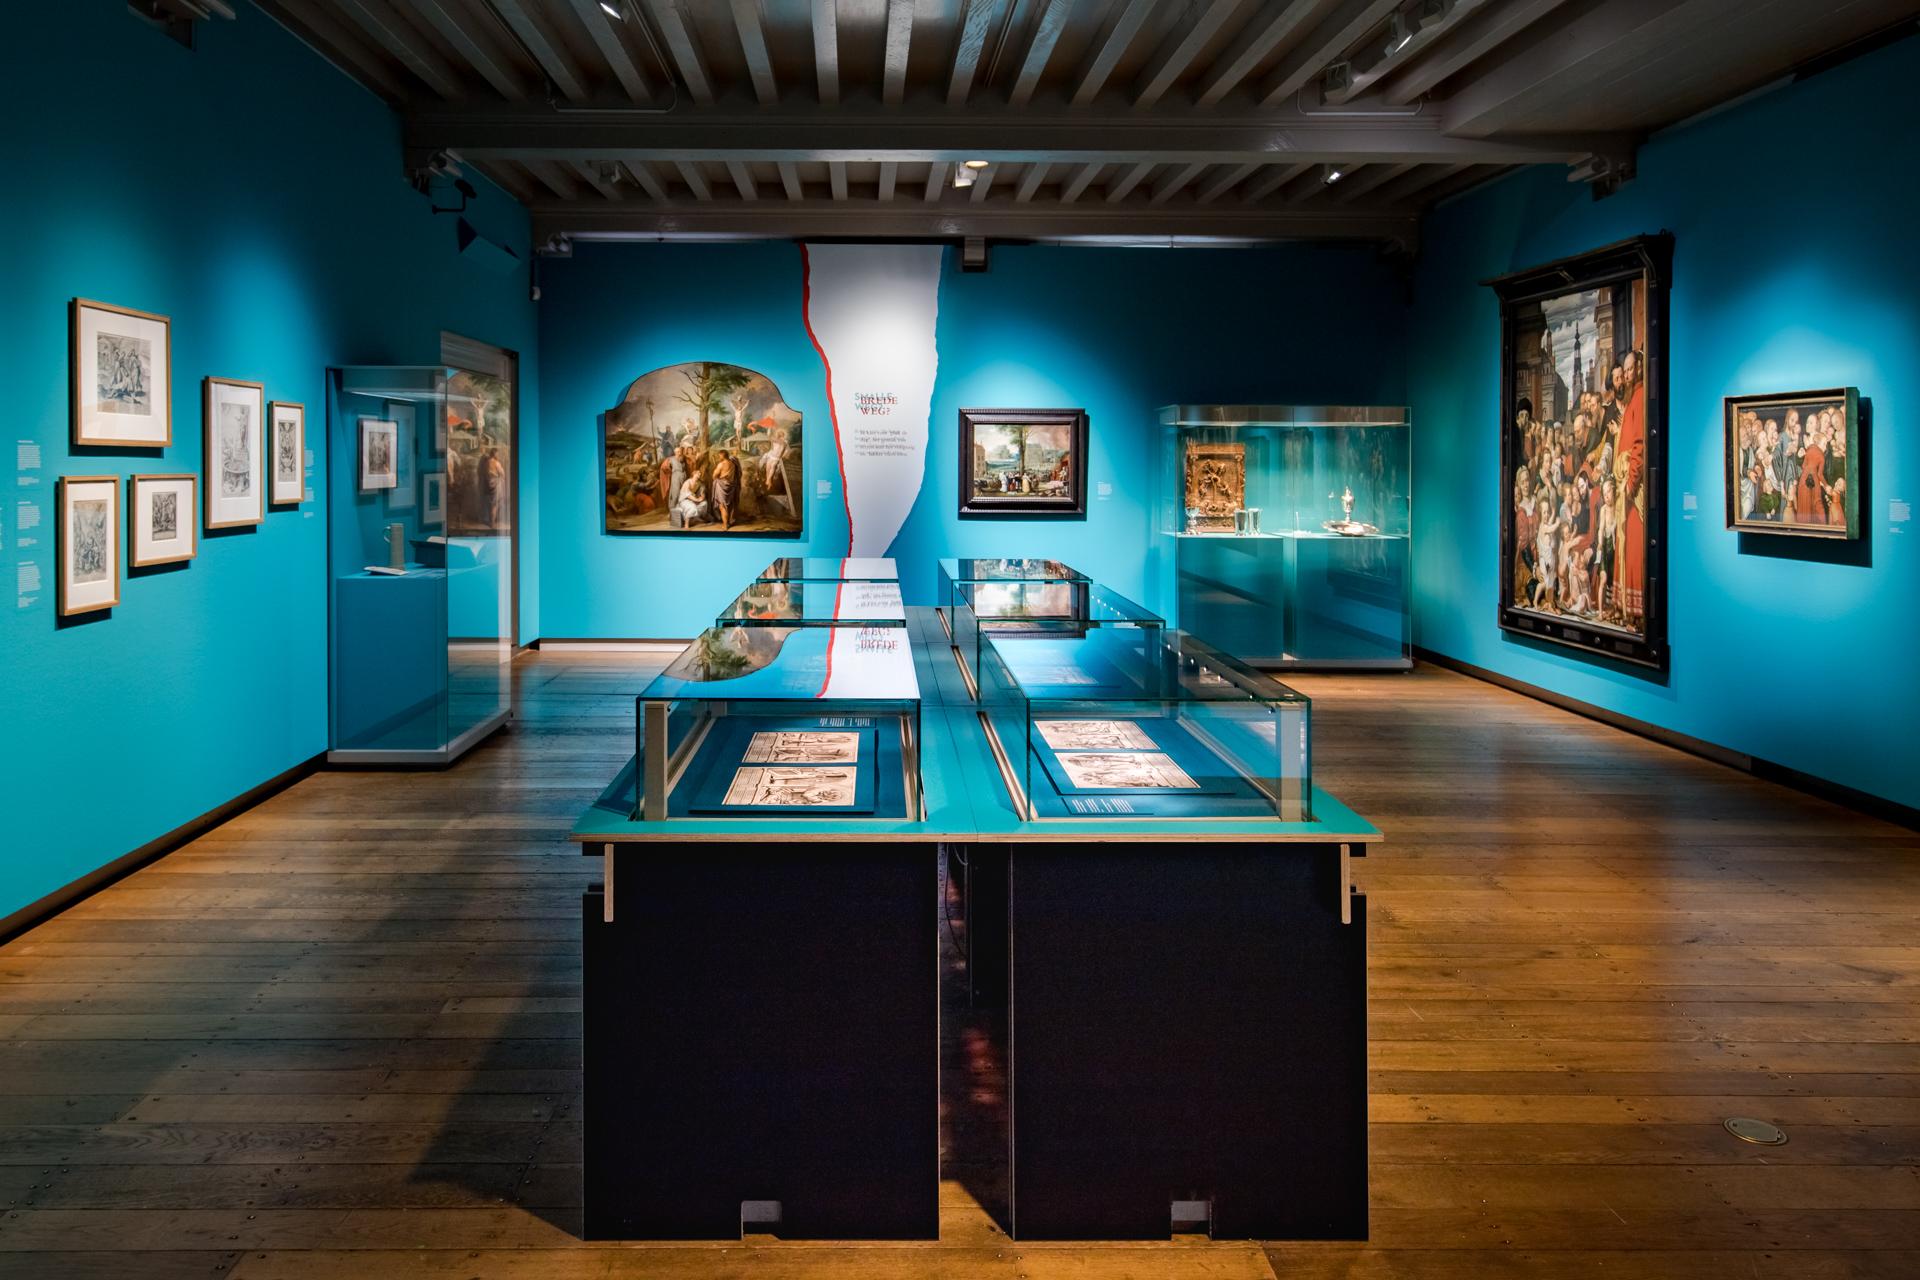 tentoonstellingsontwerp luther museum catherijneconvent 13 jpg